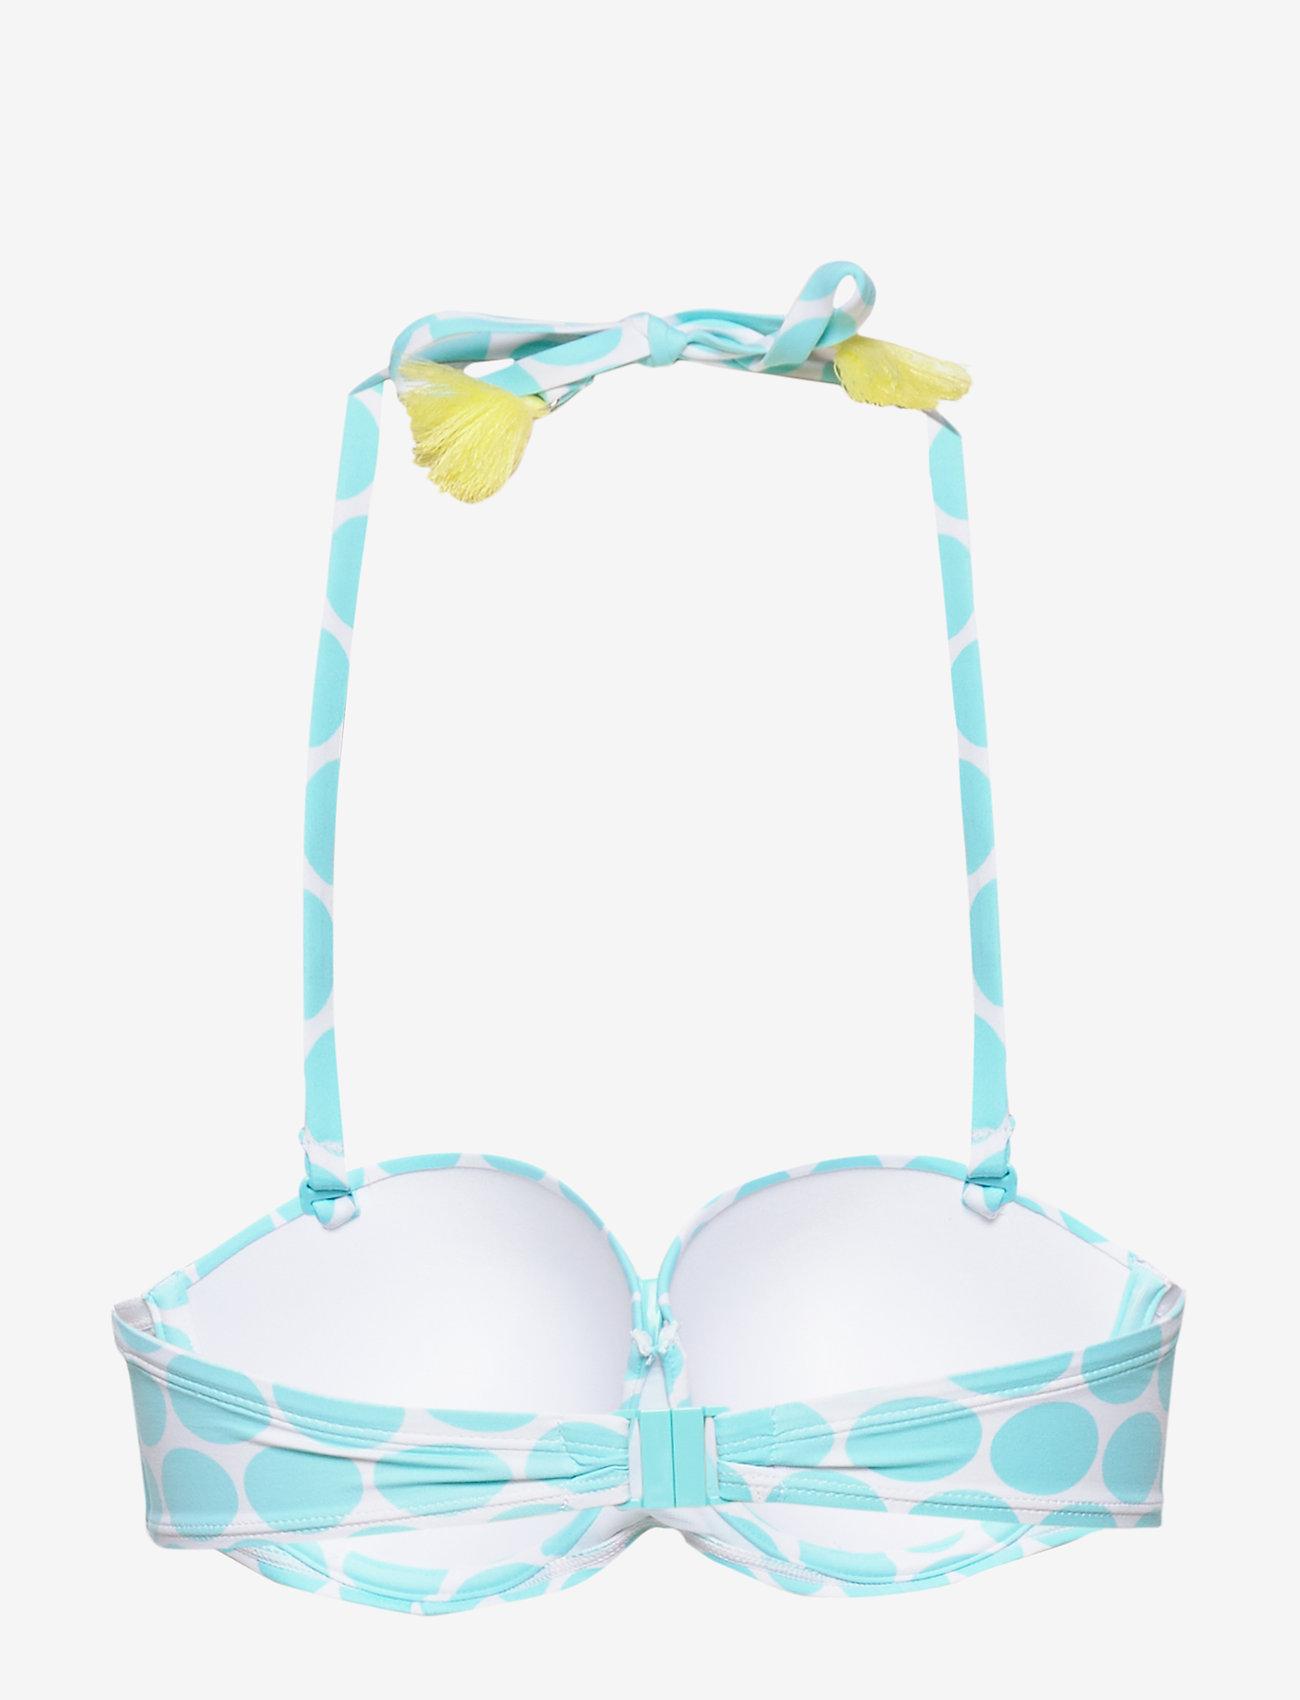 Esprit Bodywear Women - Beach Tops with wire - bikinitopper - light aqua green - 1